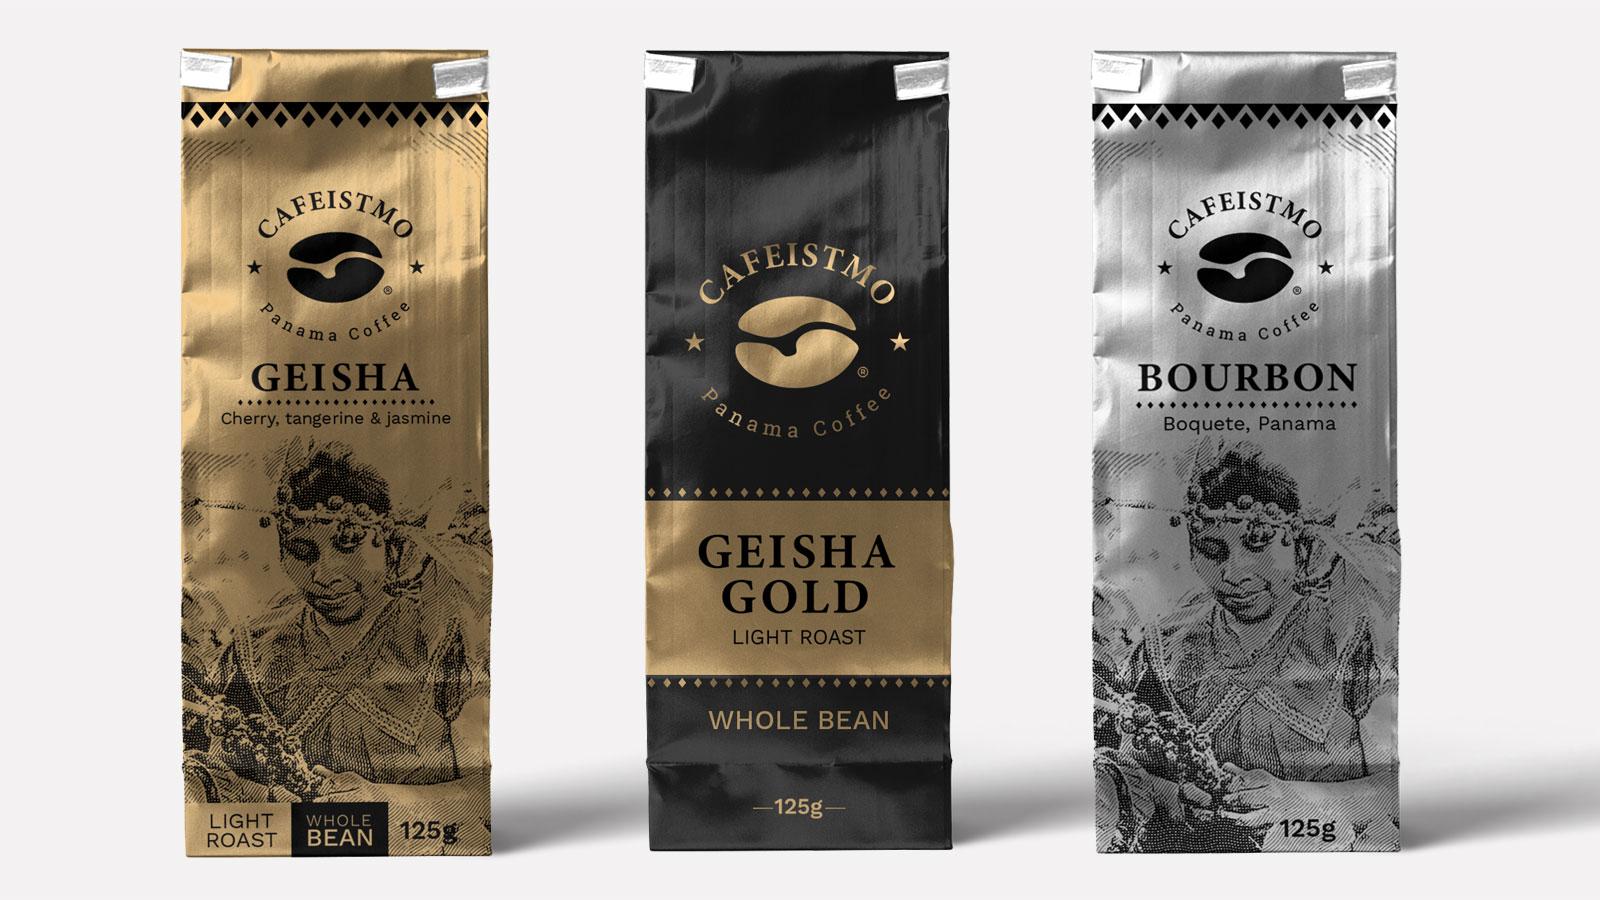 Cafeistmo - Panama coffee